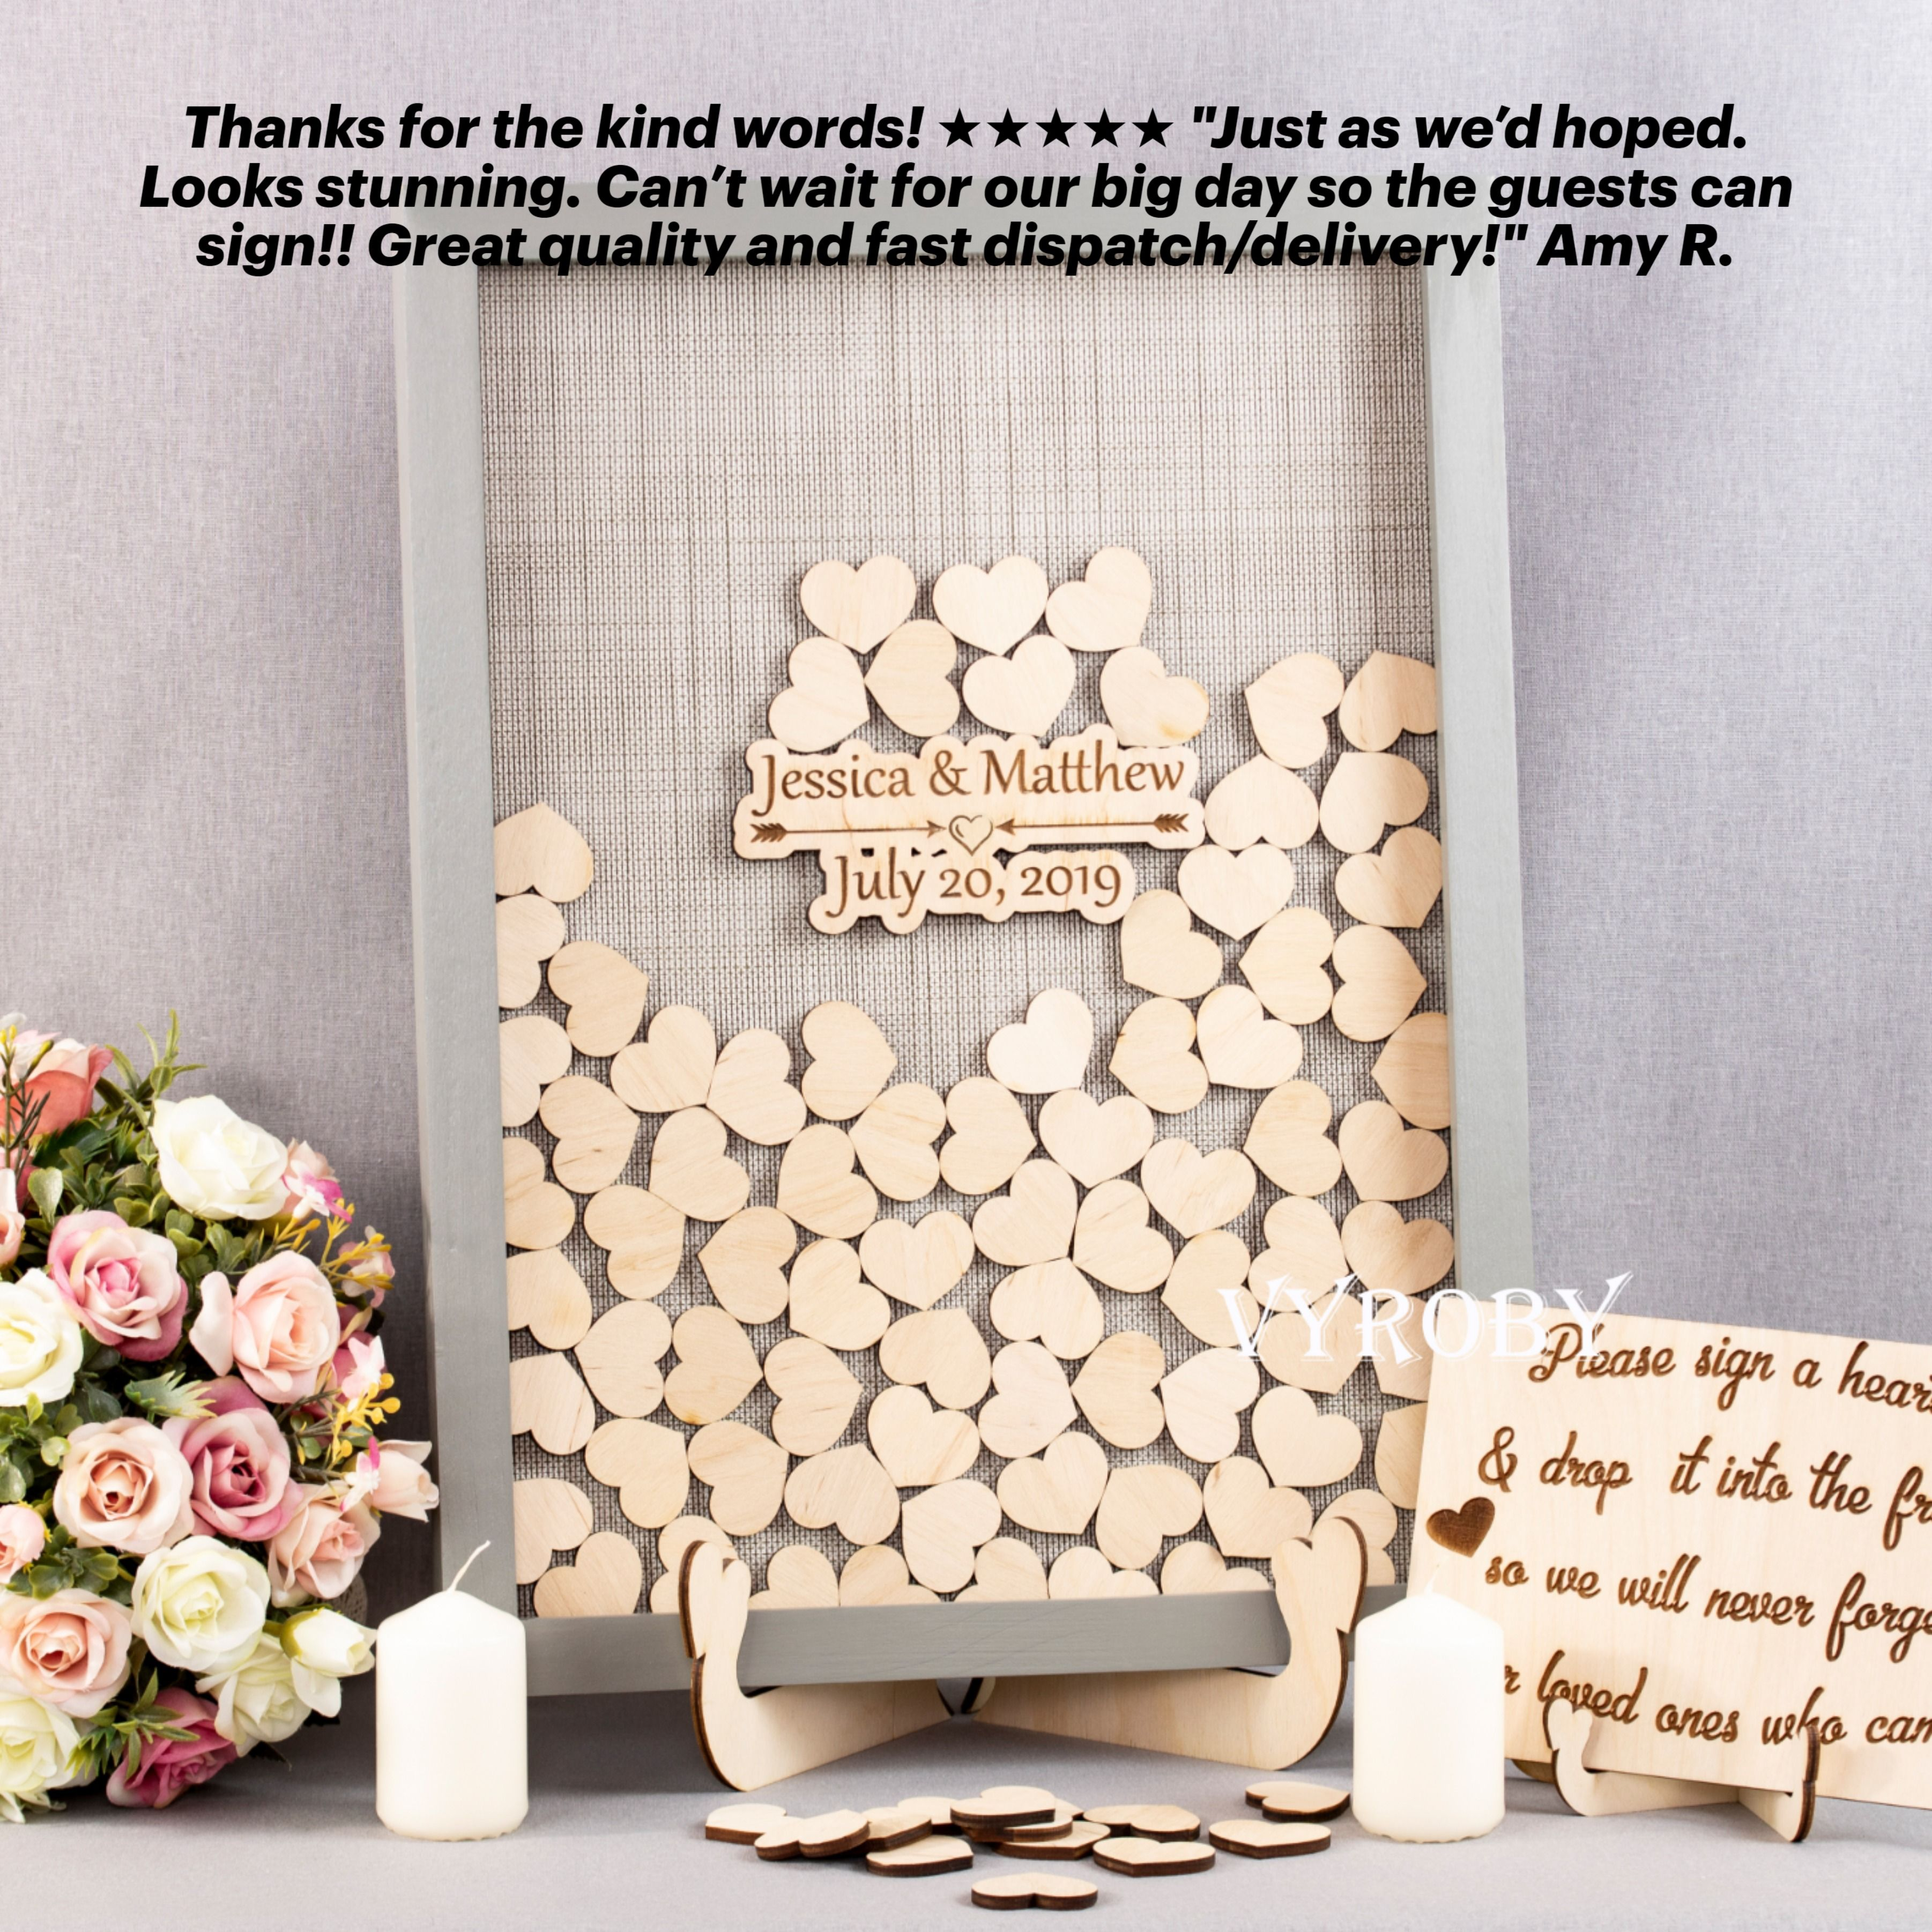 The Wedding Guest Kellerman Review: Пін на дошці «Reviews About Us»